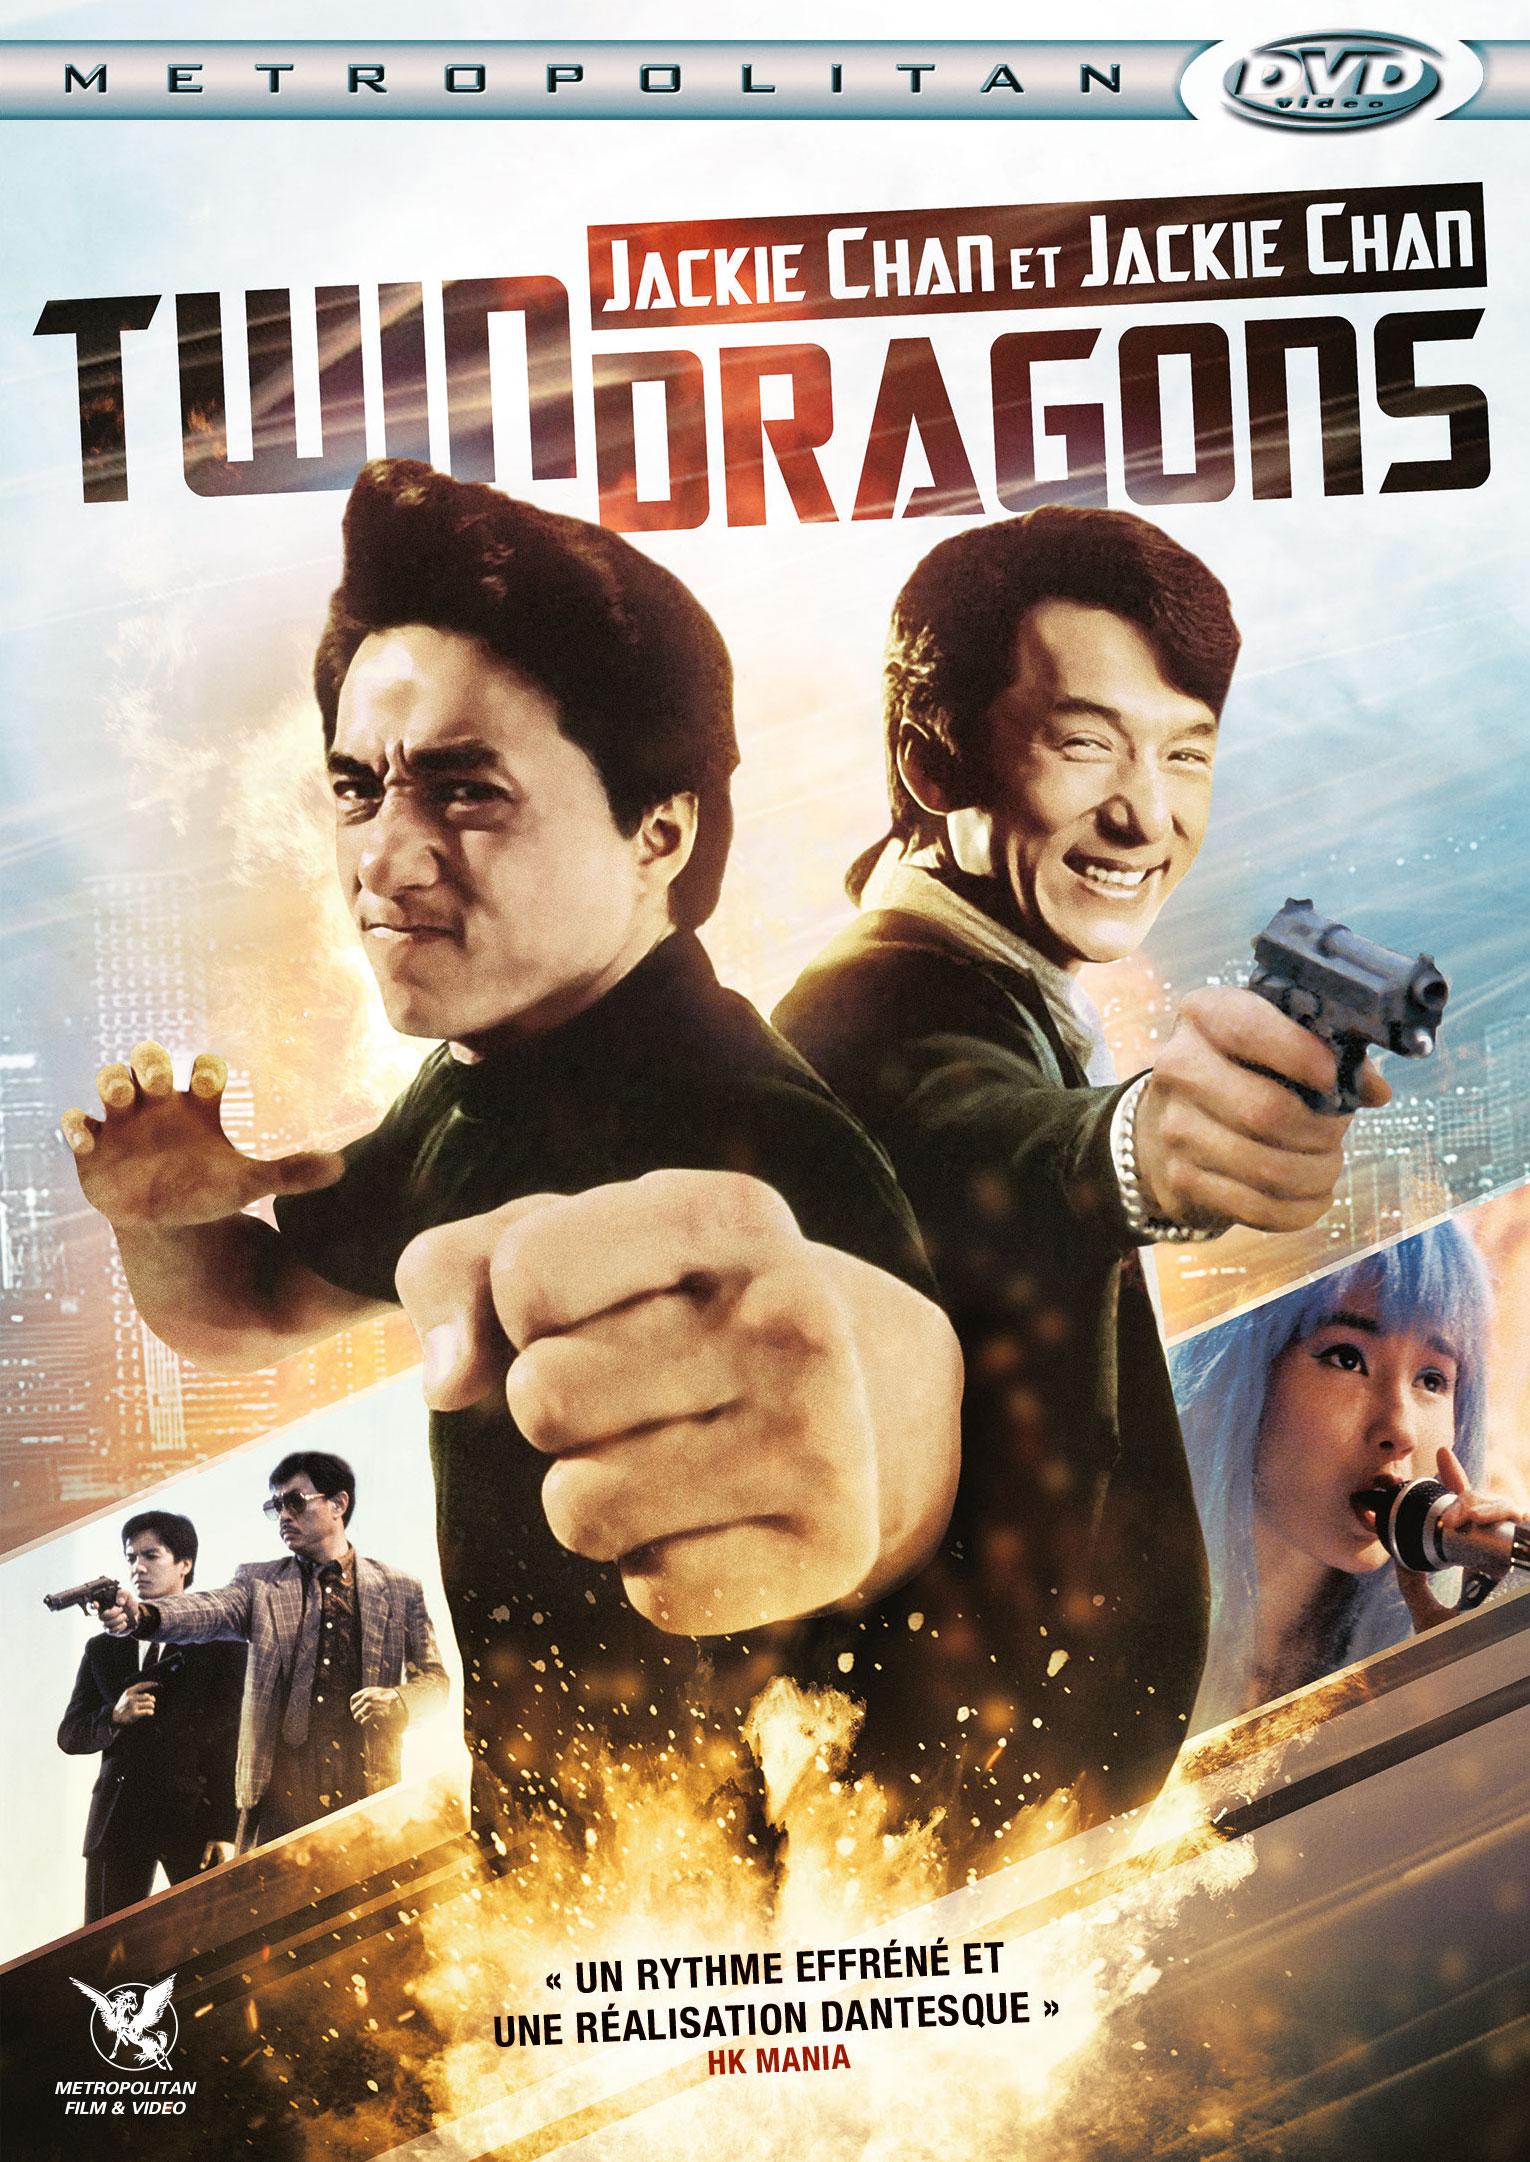 TD DVD